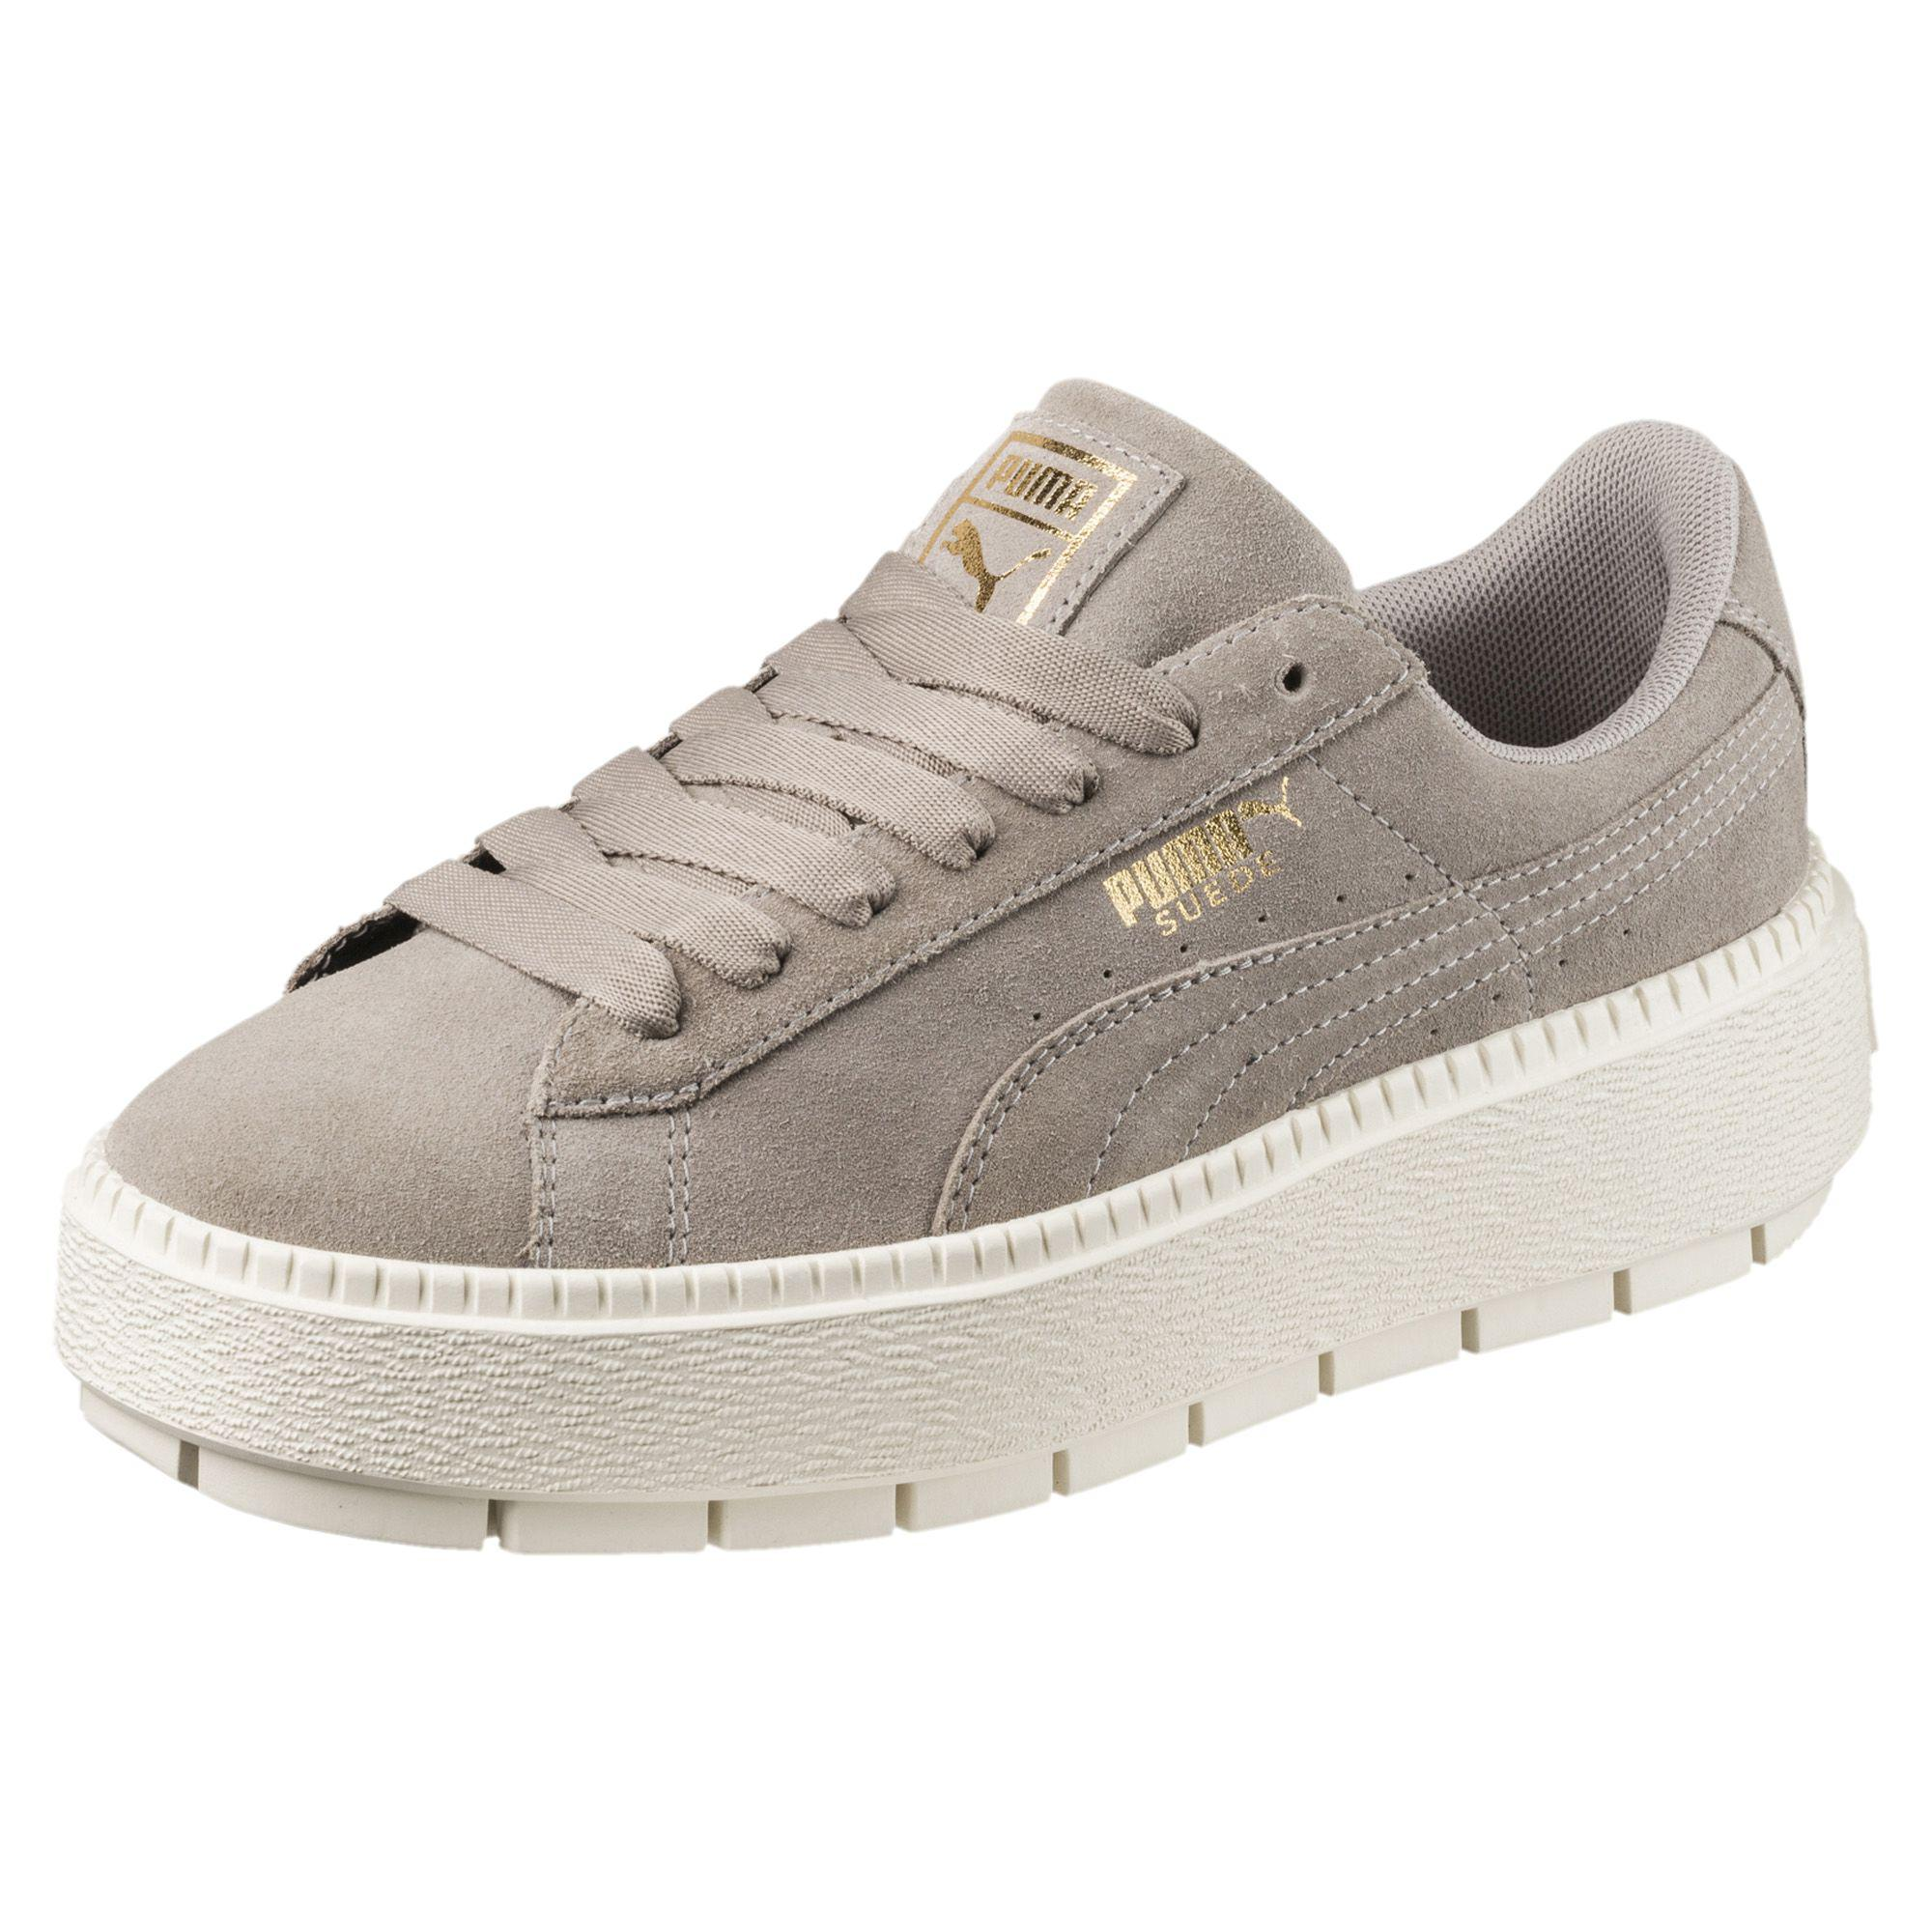 8420c87a92c Lyst - PUMA Platform Trace Women s Sneakers